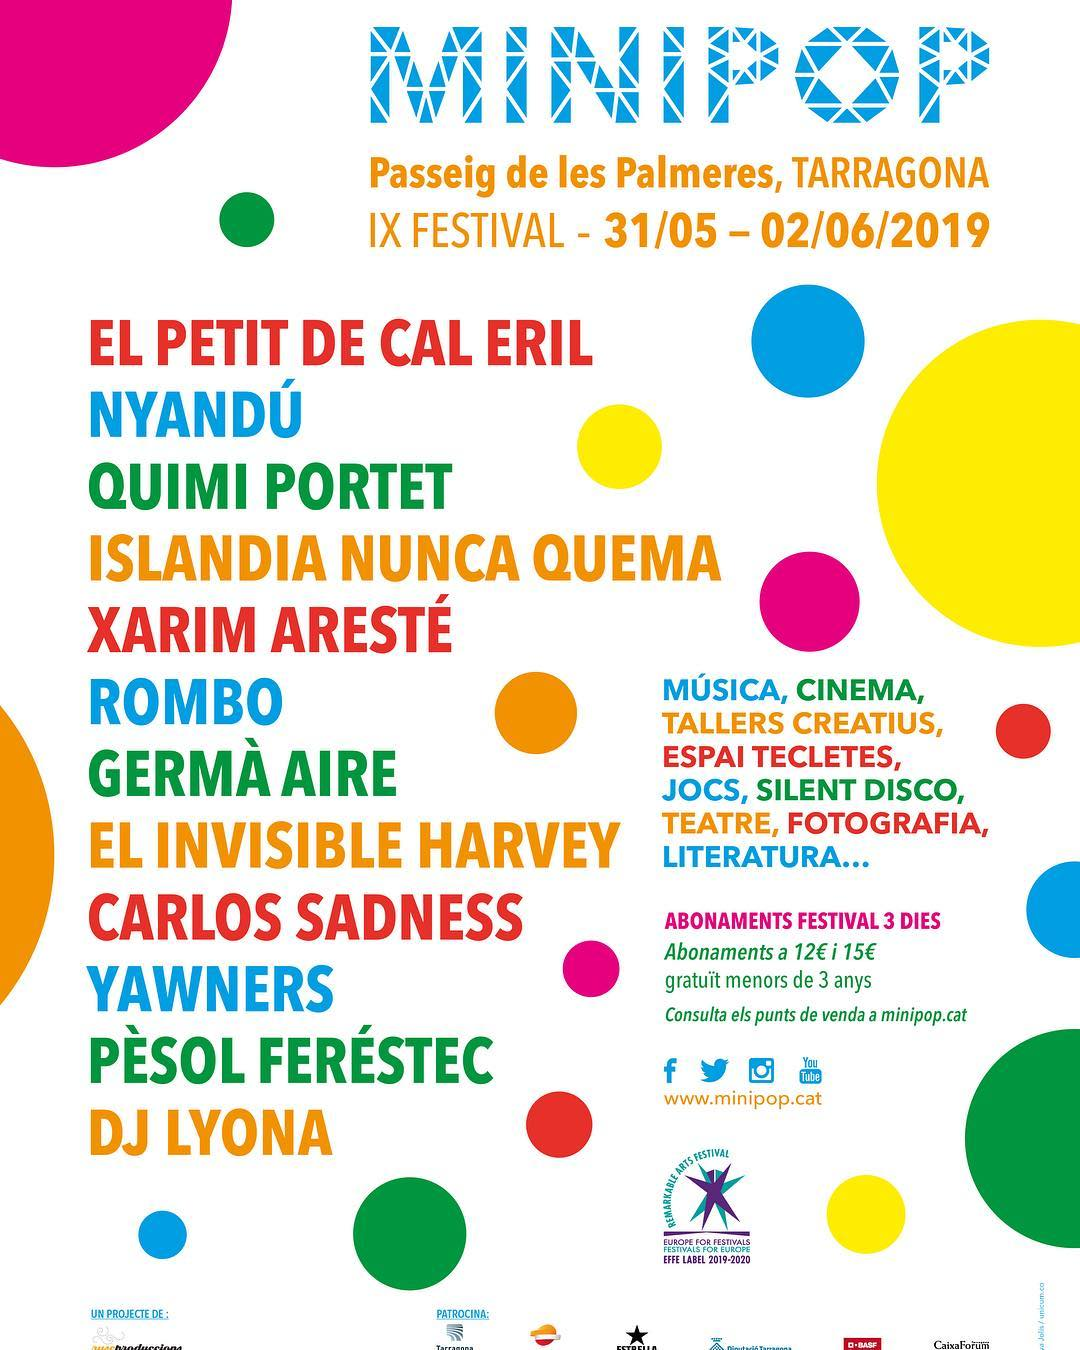 MINIPOP (Tarragona)